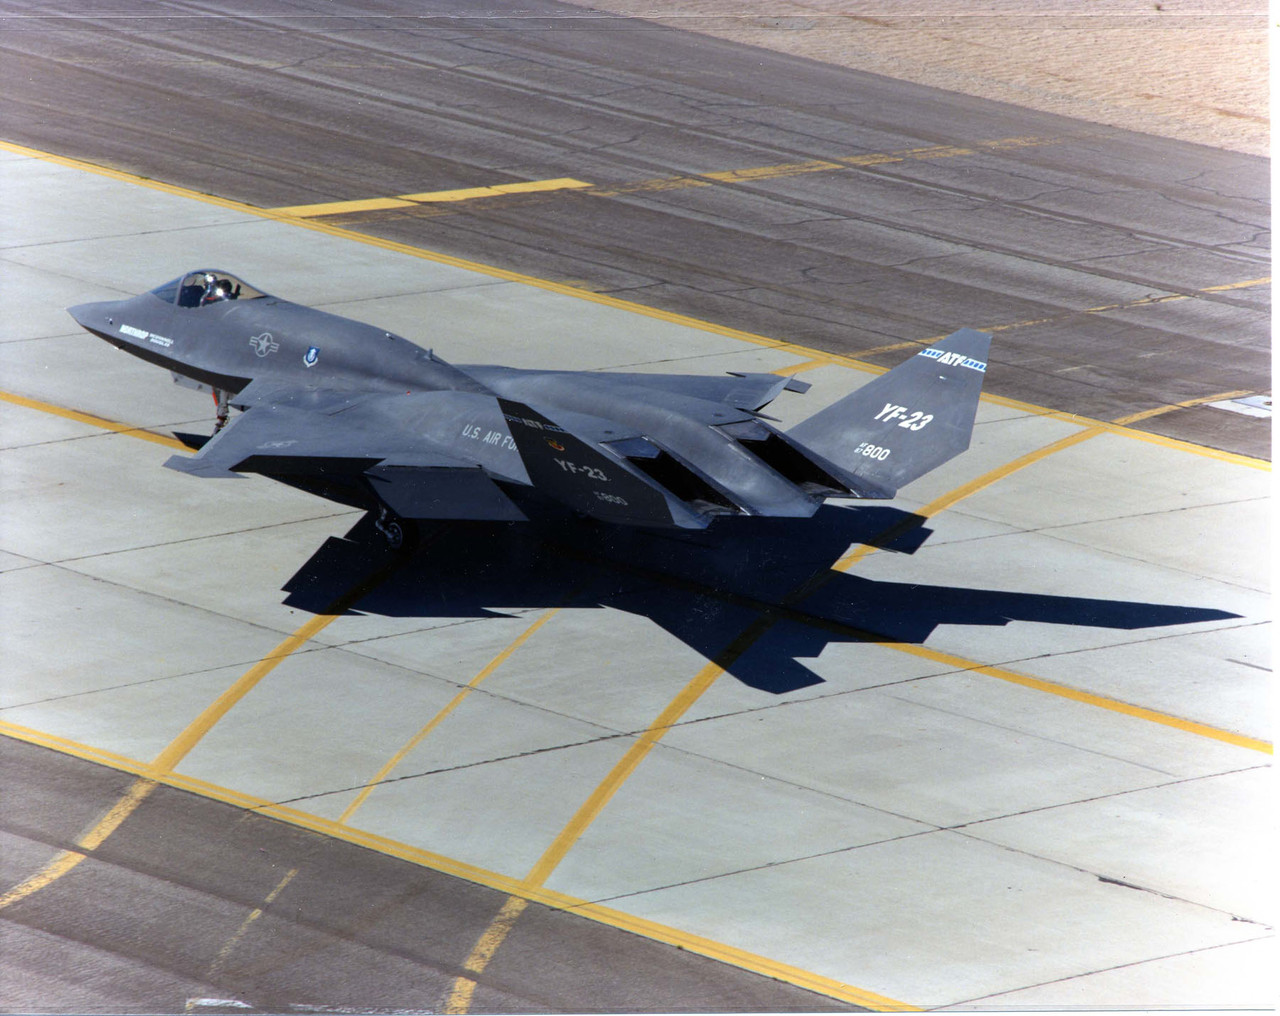 YF 23 (航空機)の画像 p1_17